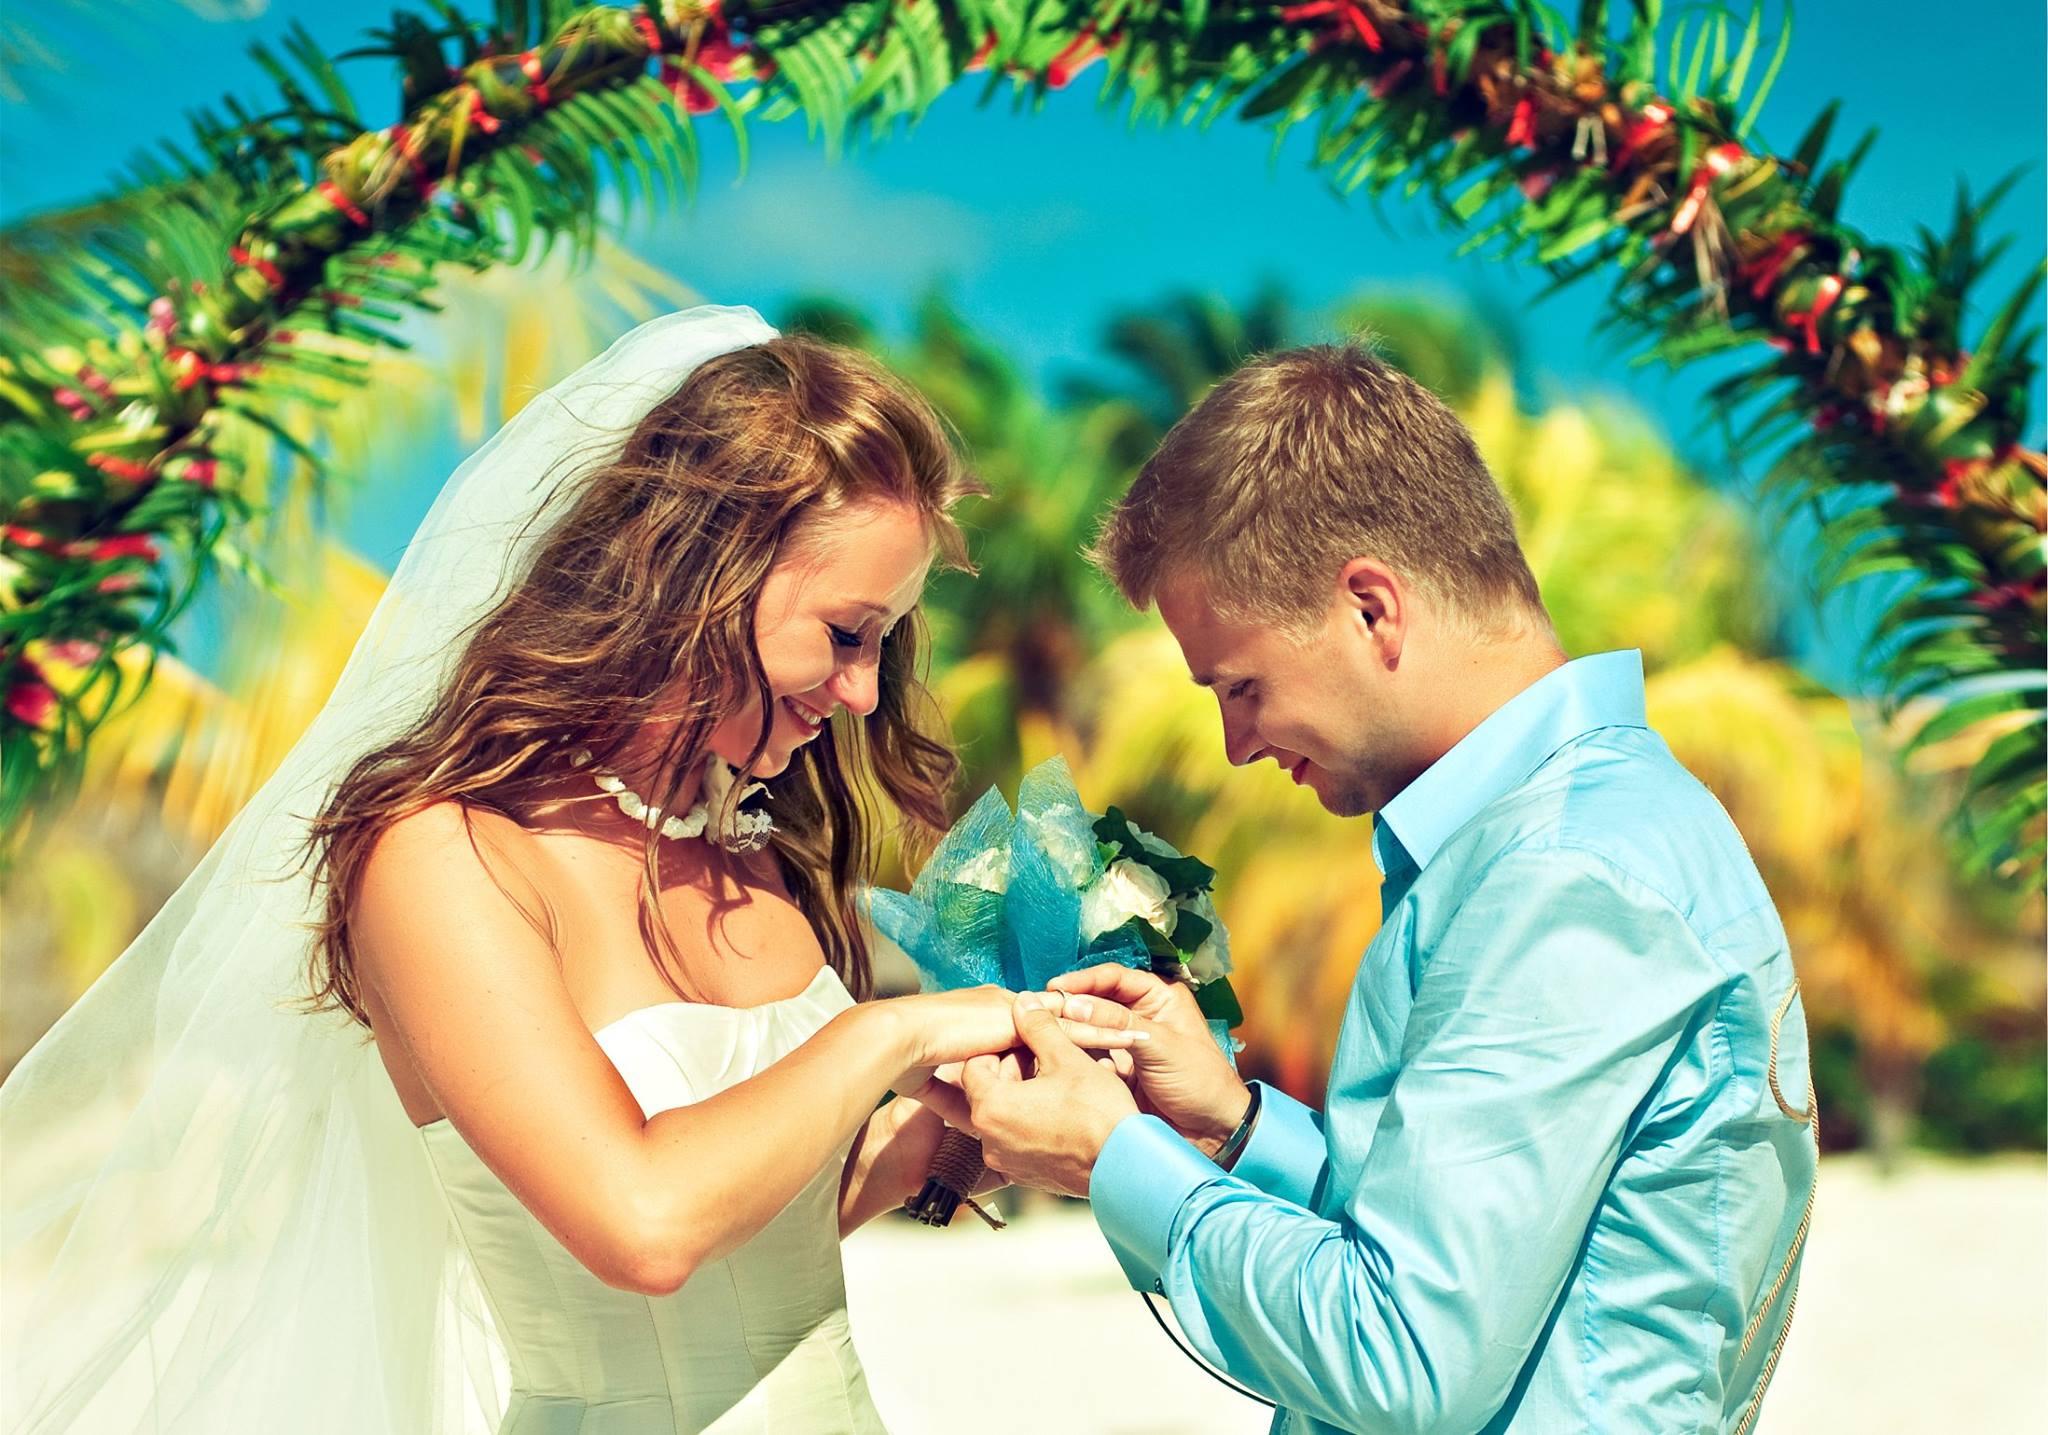 صور عريس وعروسه يوم الزفاف 6 صور عريس وعروسه يوم الزفاف